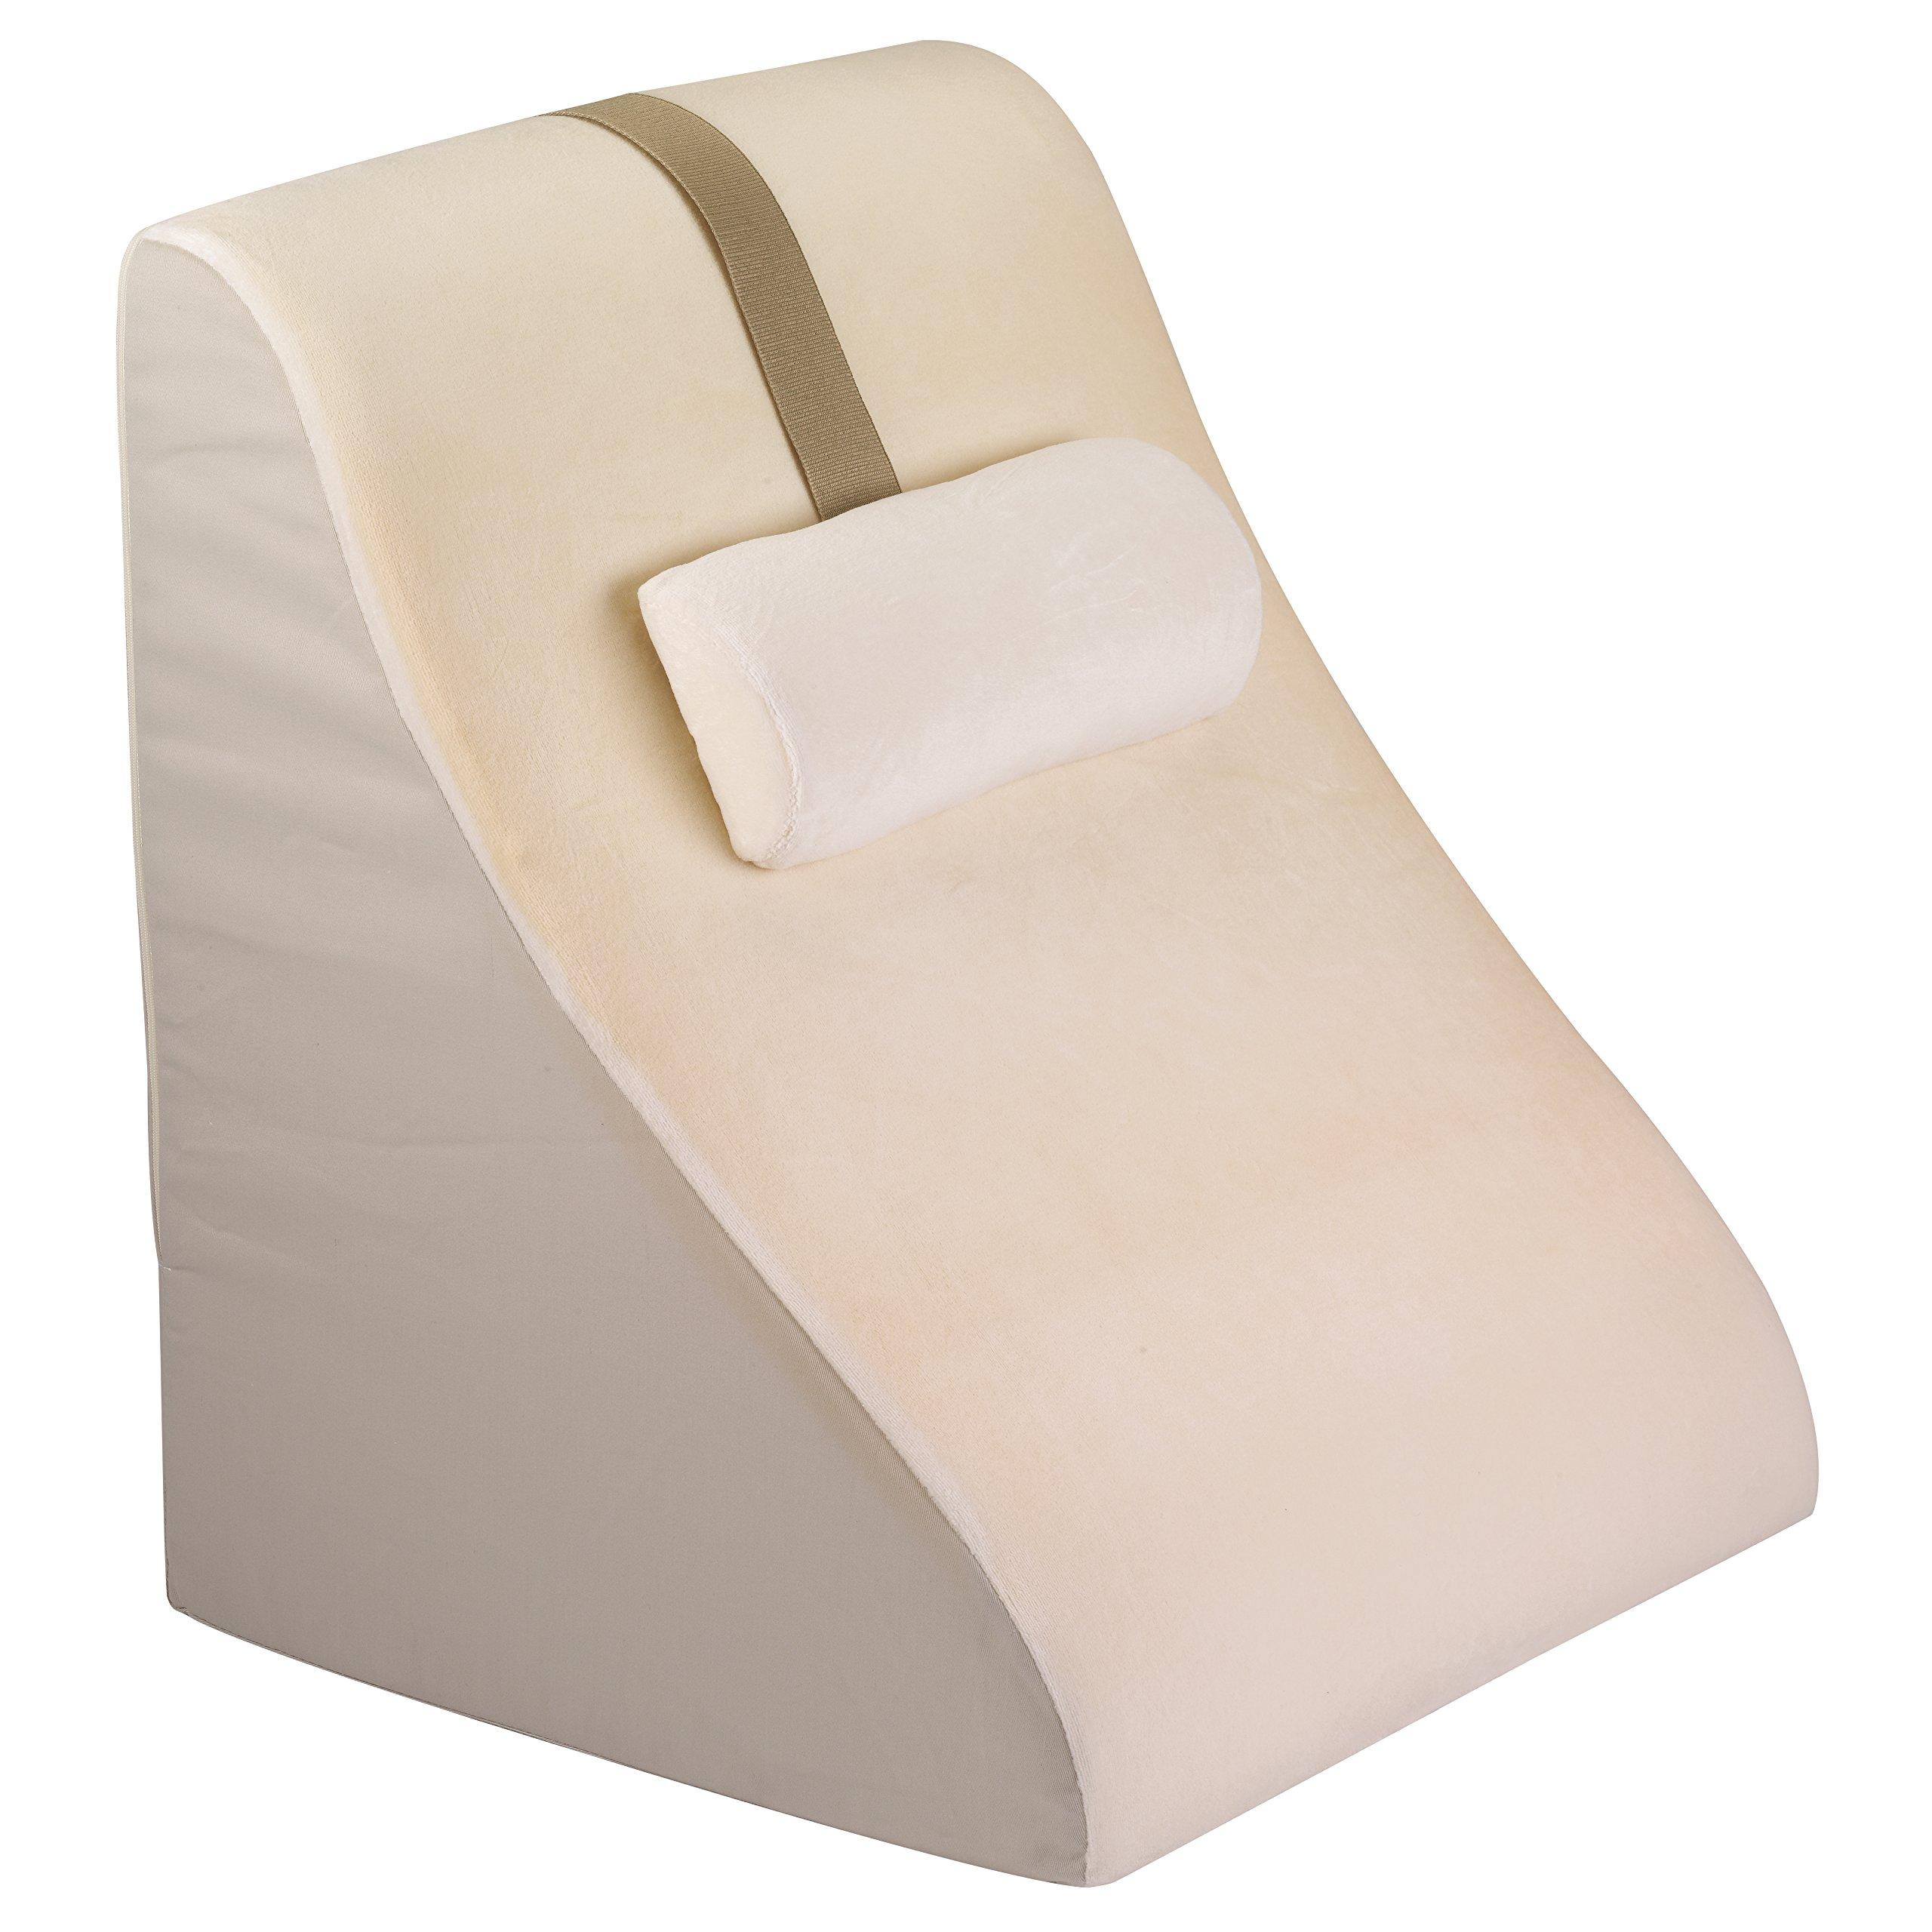 jobri bed wedge with memory foam back support new. Black Bedroom Furniture Sets. Home Design Ideas